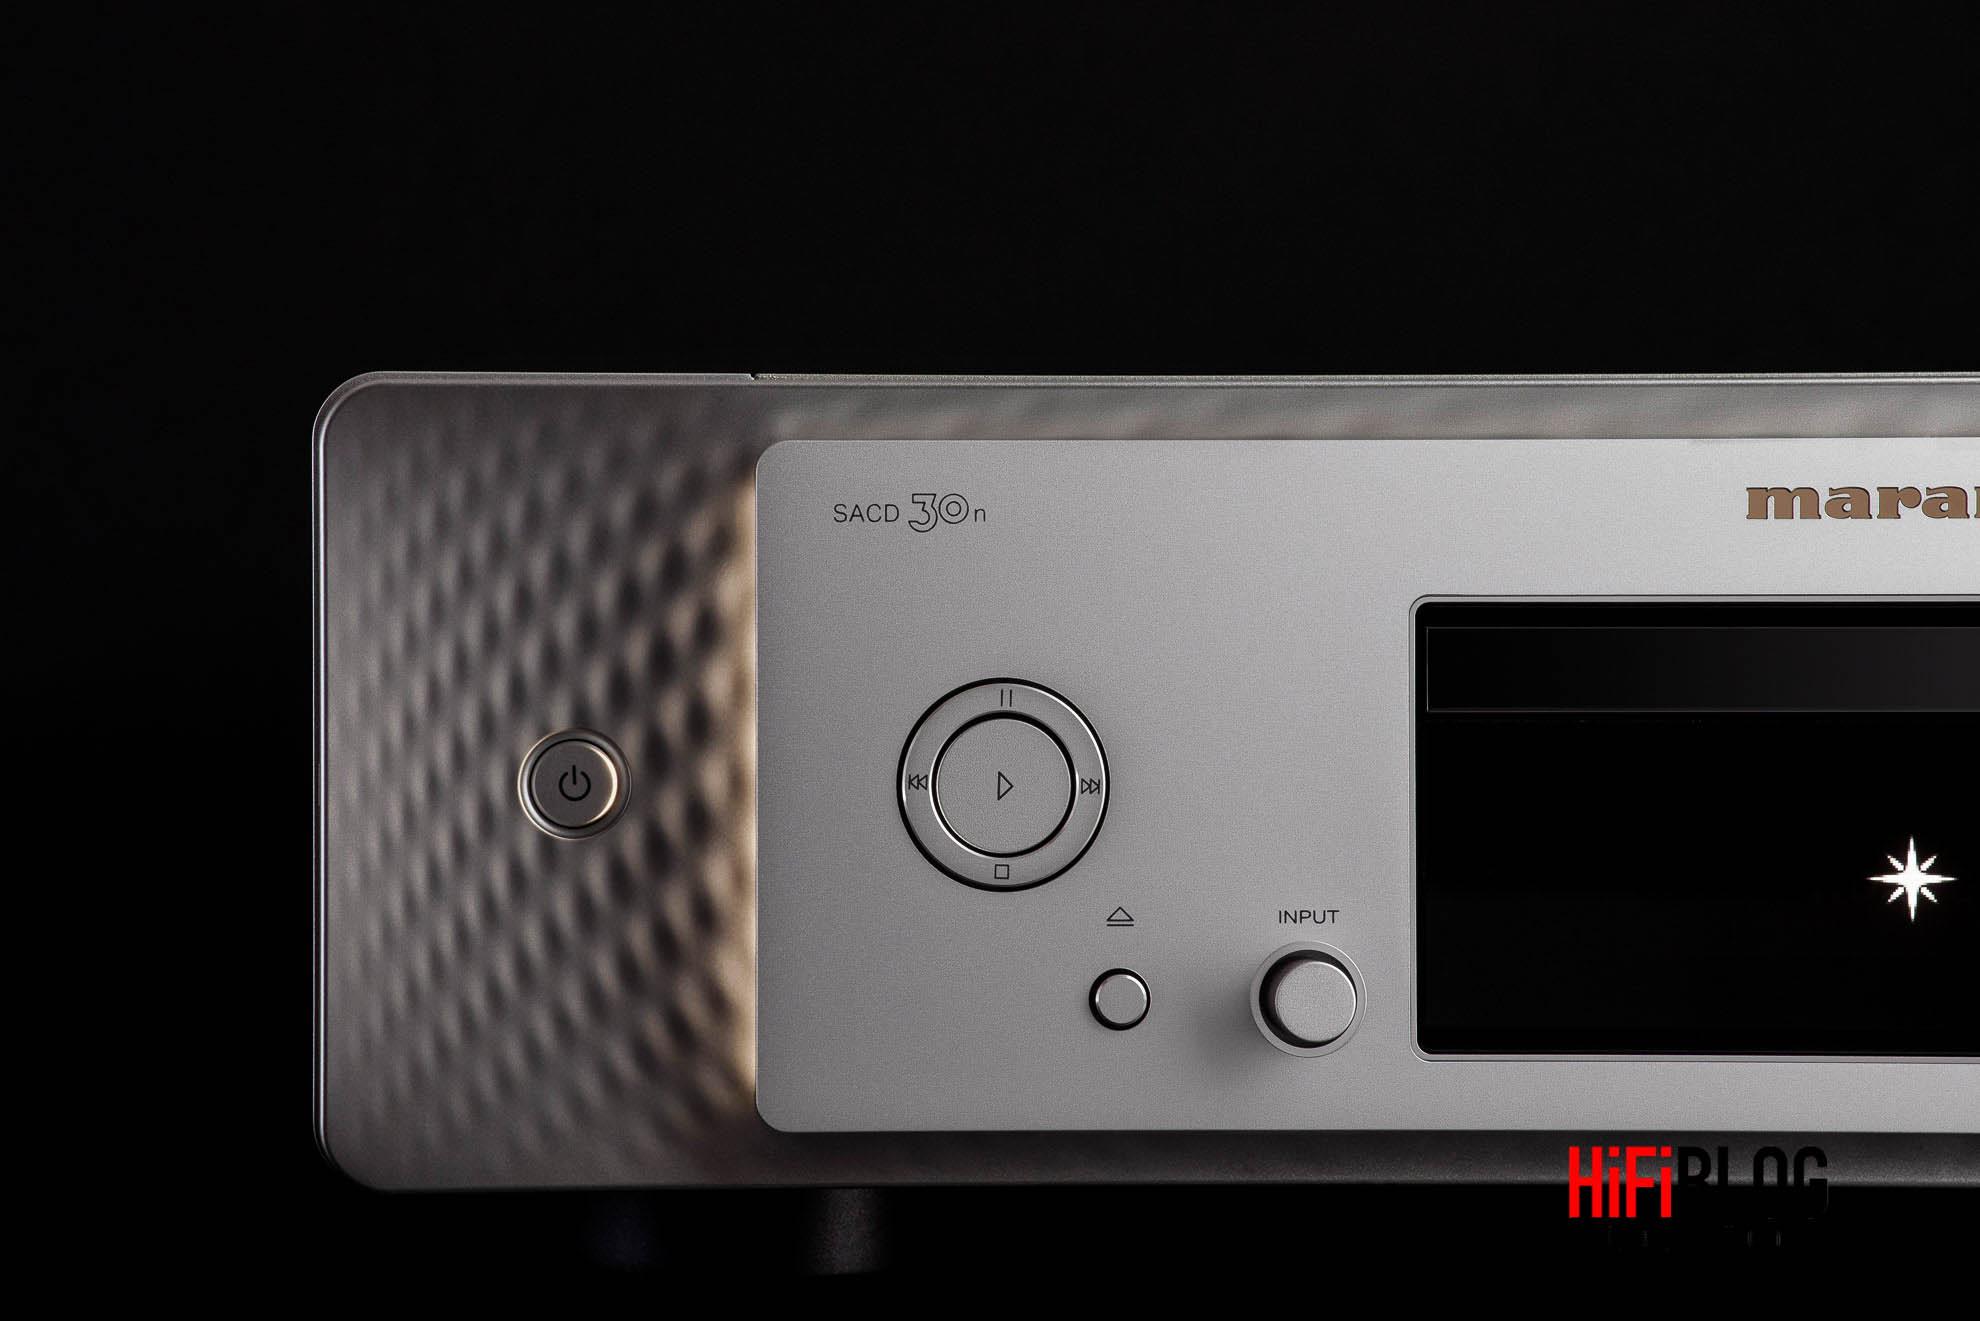 Marantz Model 30 Integrated Amplifier and SACD 30n Network SACD Player 40